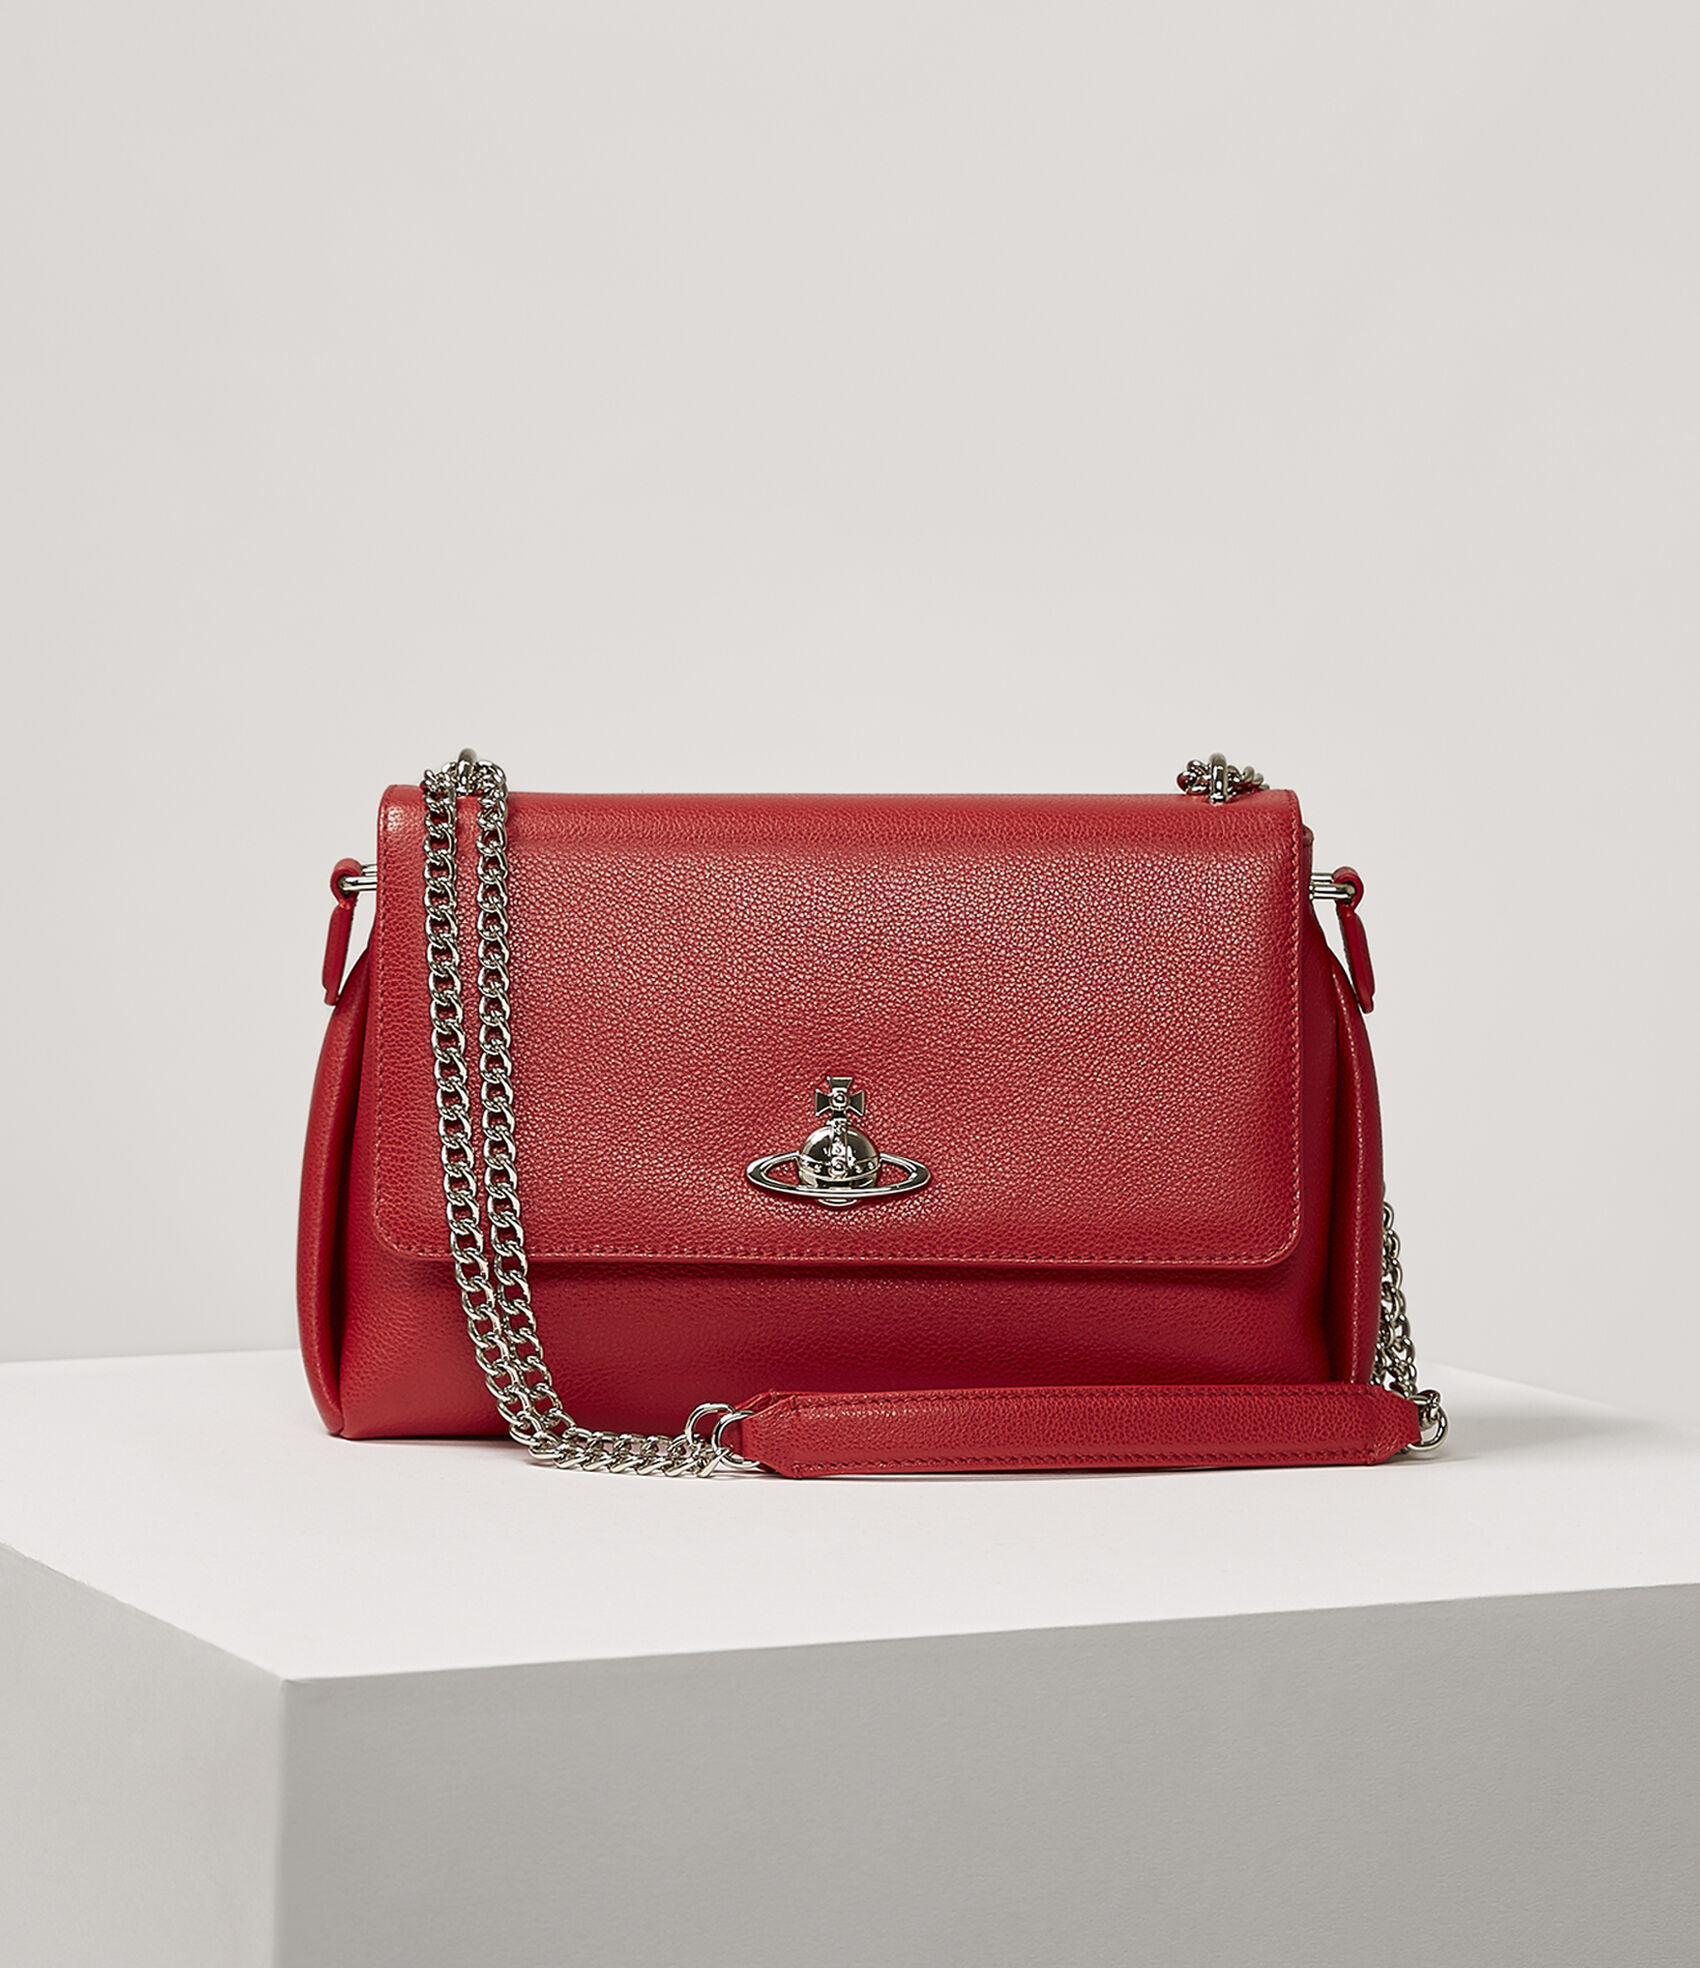 Vivienne Westwood Women S Designer Crossbody Bags Windsor Bag Red